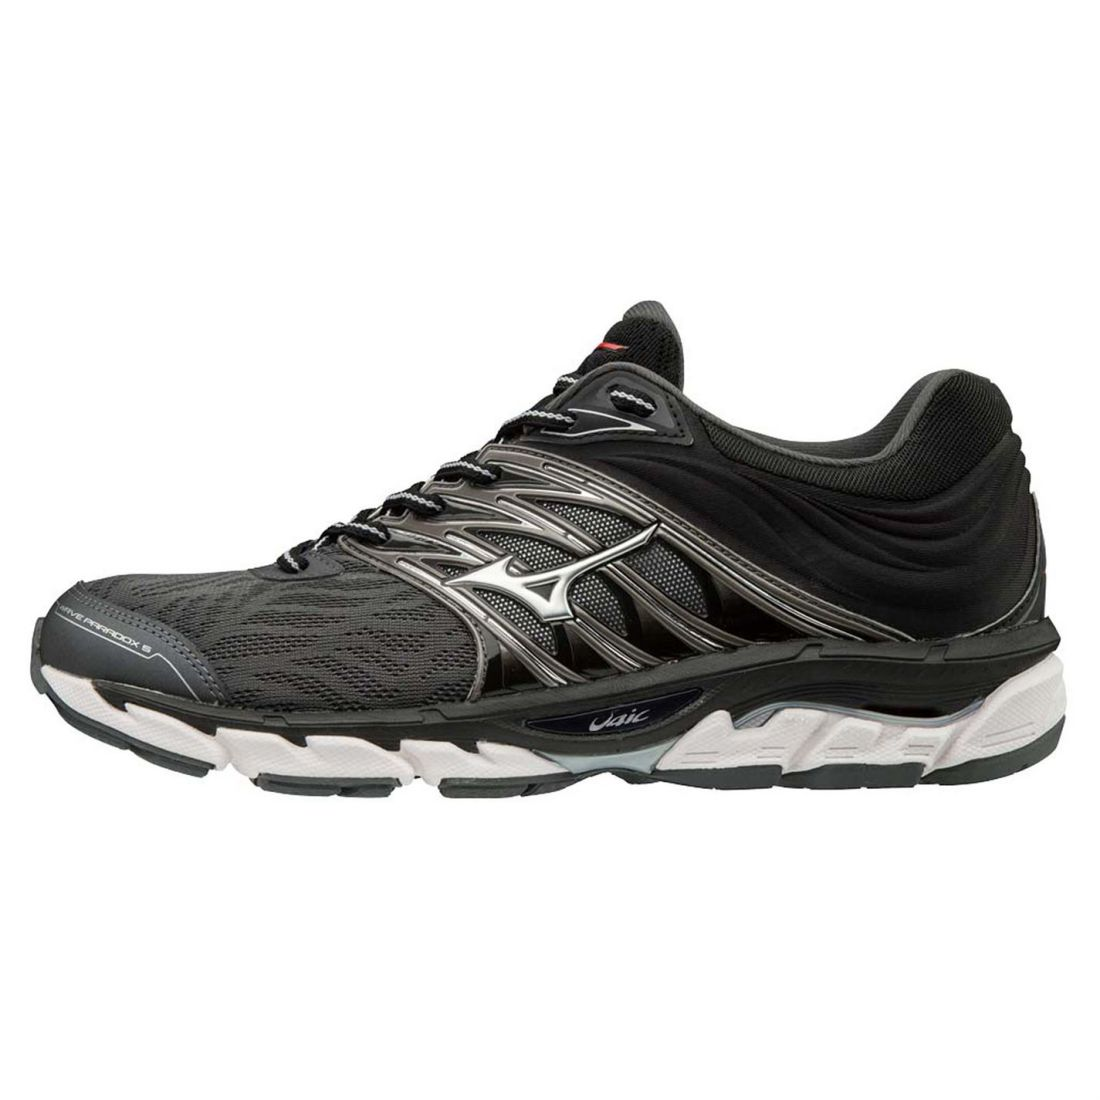 Wave Paradox 5 Running shoes Mens Gents Road Mesh Upper